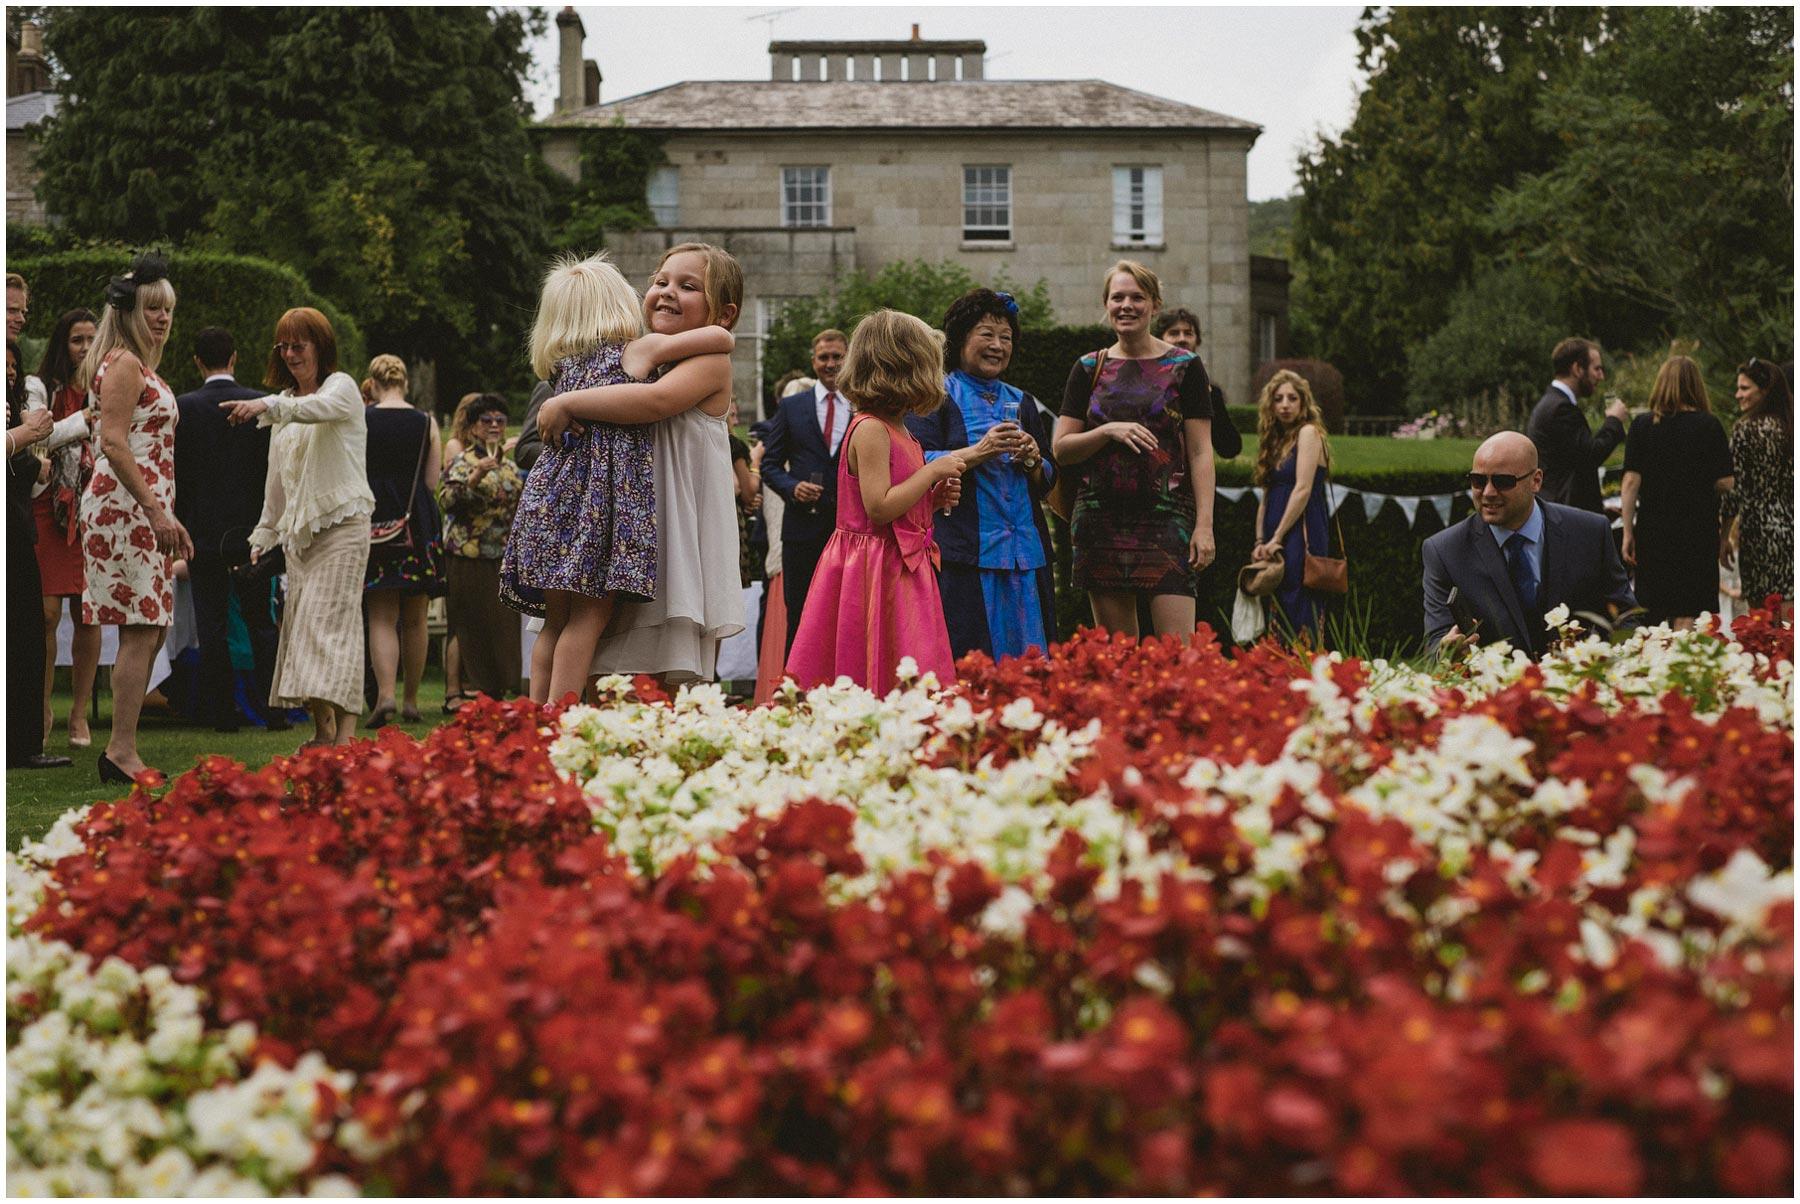 Colehayes-Park-Wedding-Photography_0104